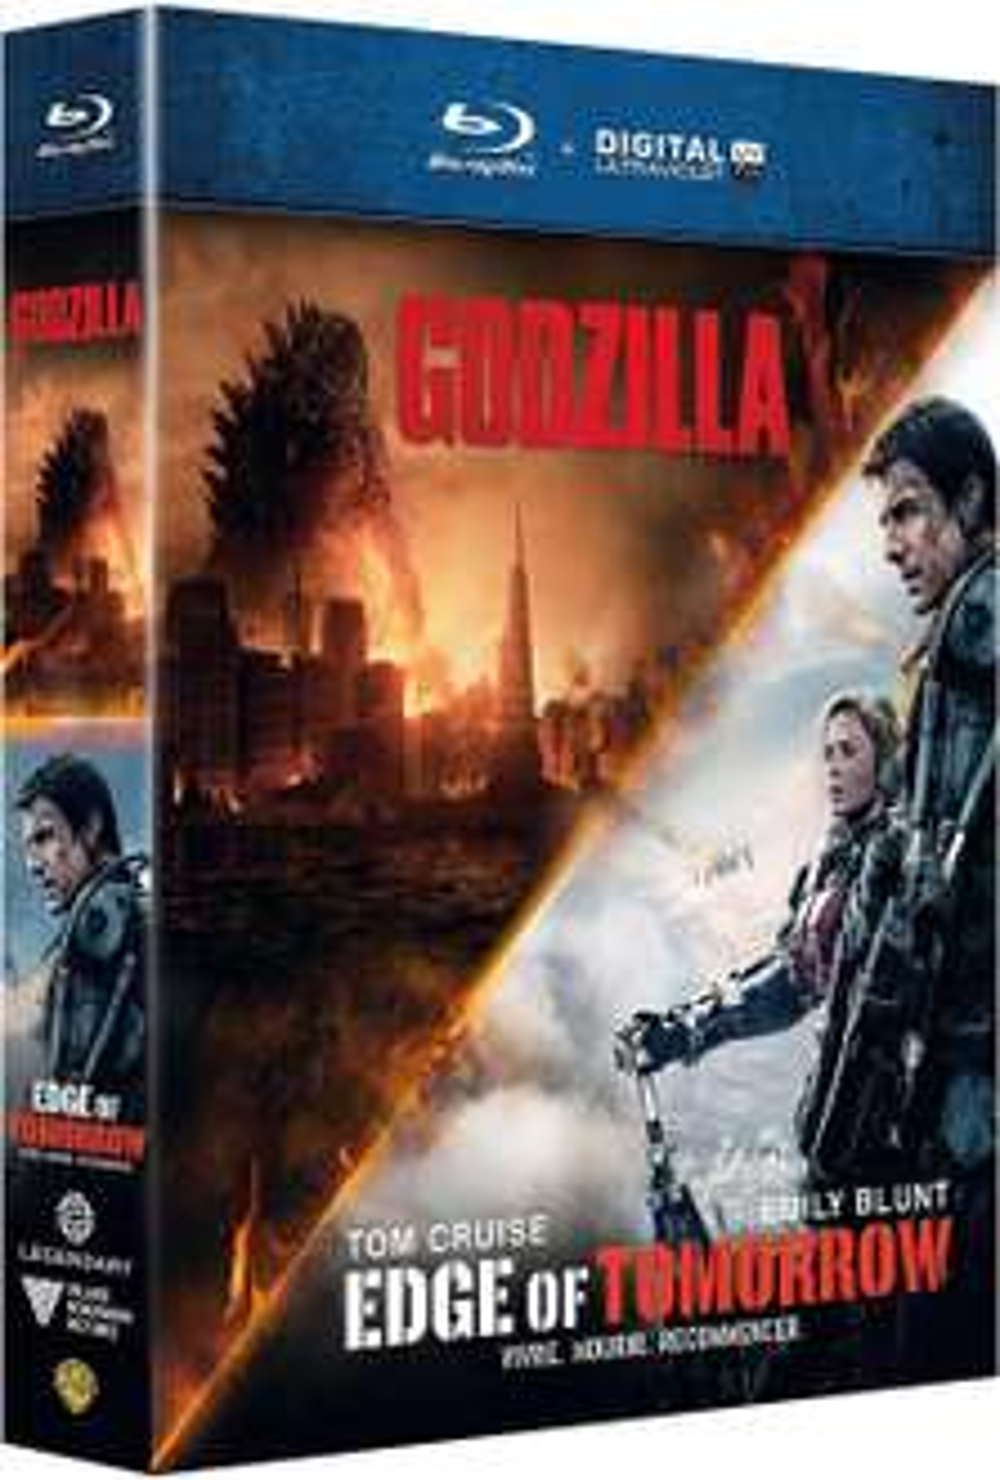 Coffret Blu-ray : Edge of Tomorrow + Godzilla